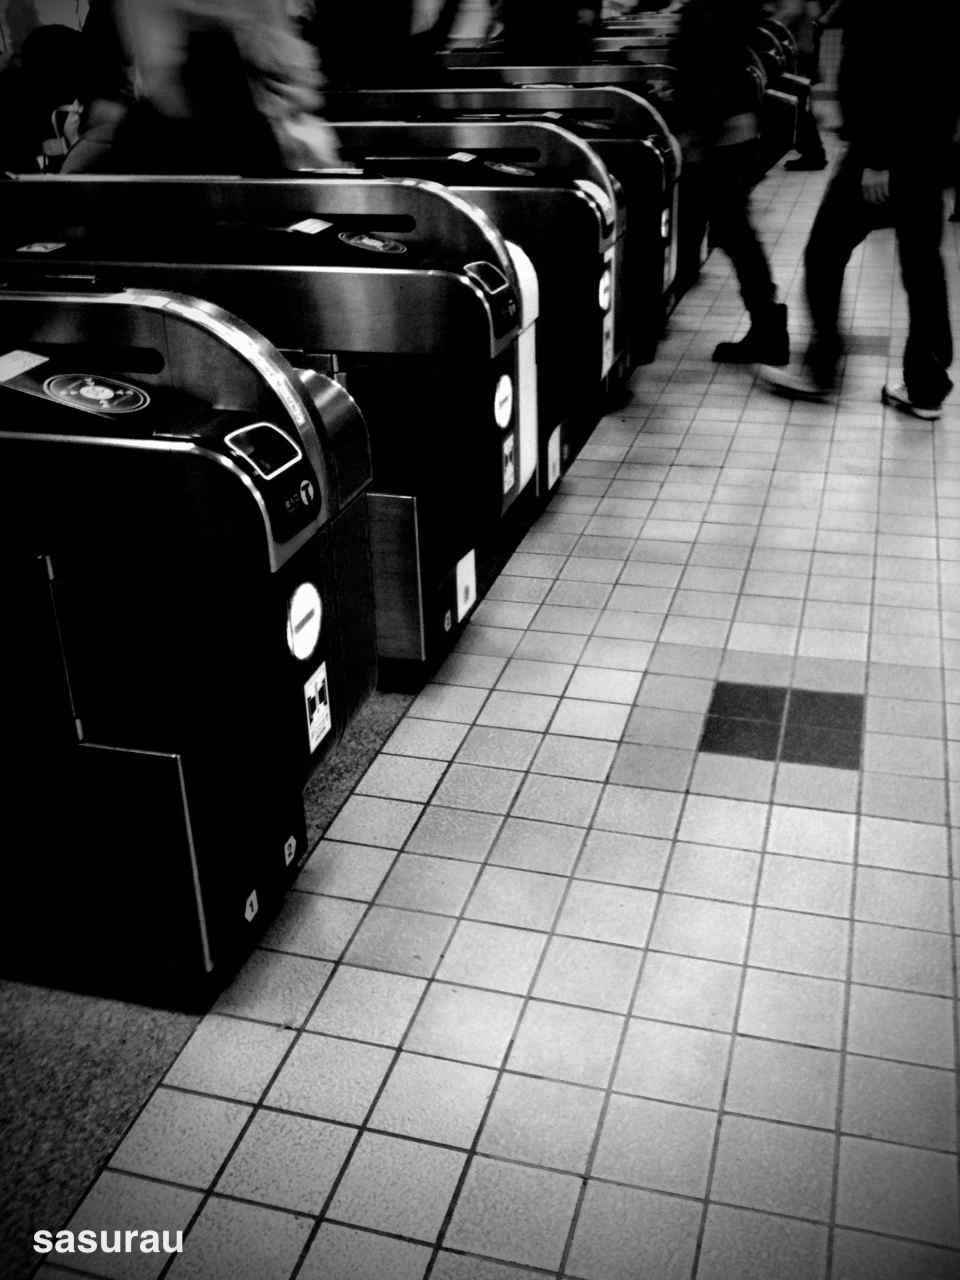 4127453-photo_by_camerakit.jpg